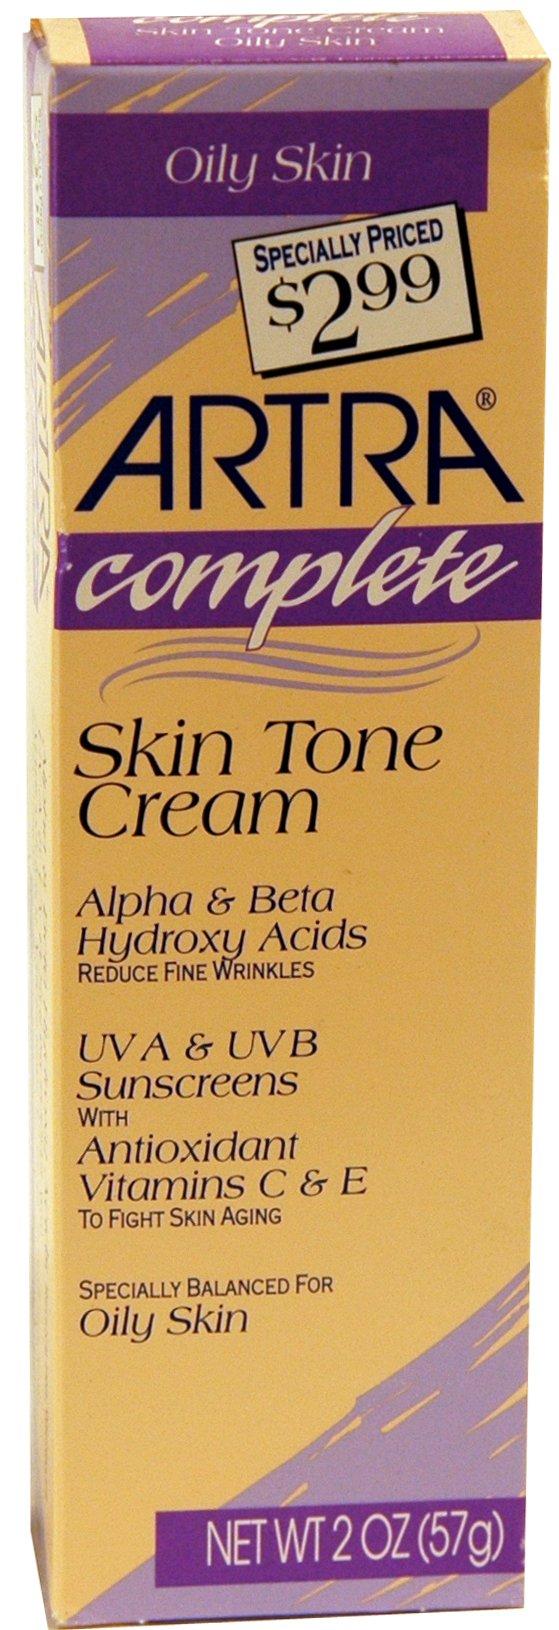 Artra Skin Tone Cream for Oily Skin, 2 oz (Pack of 2)